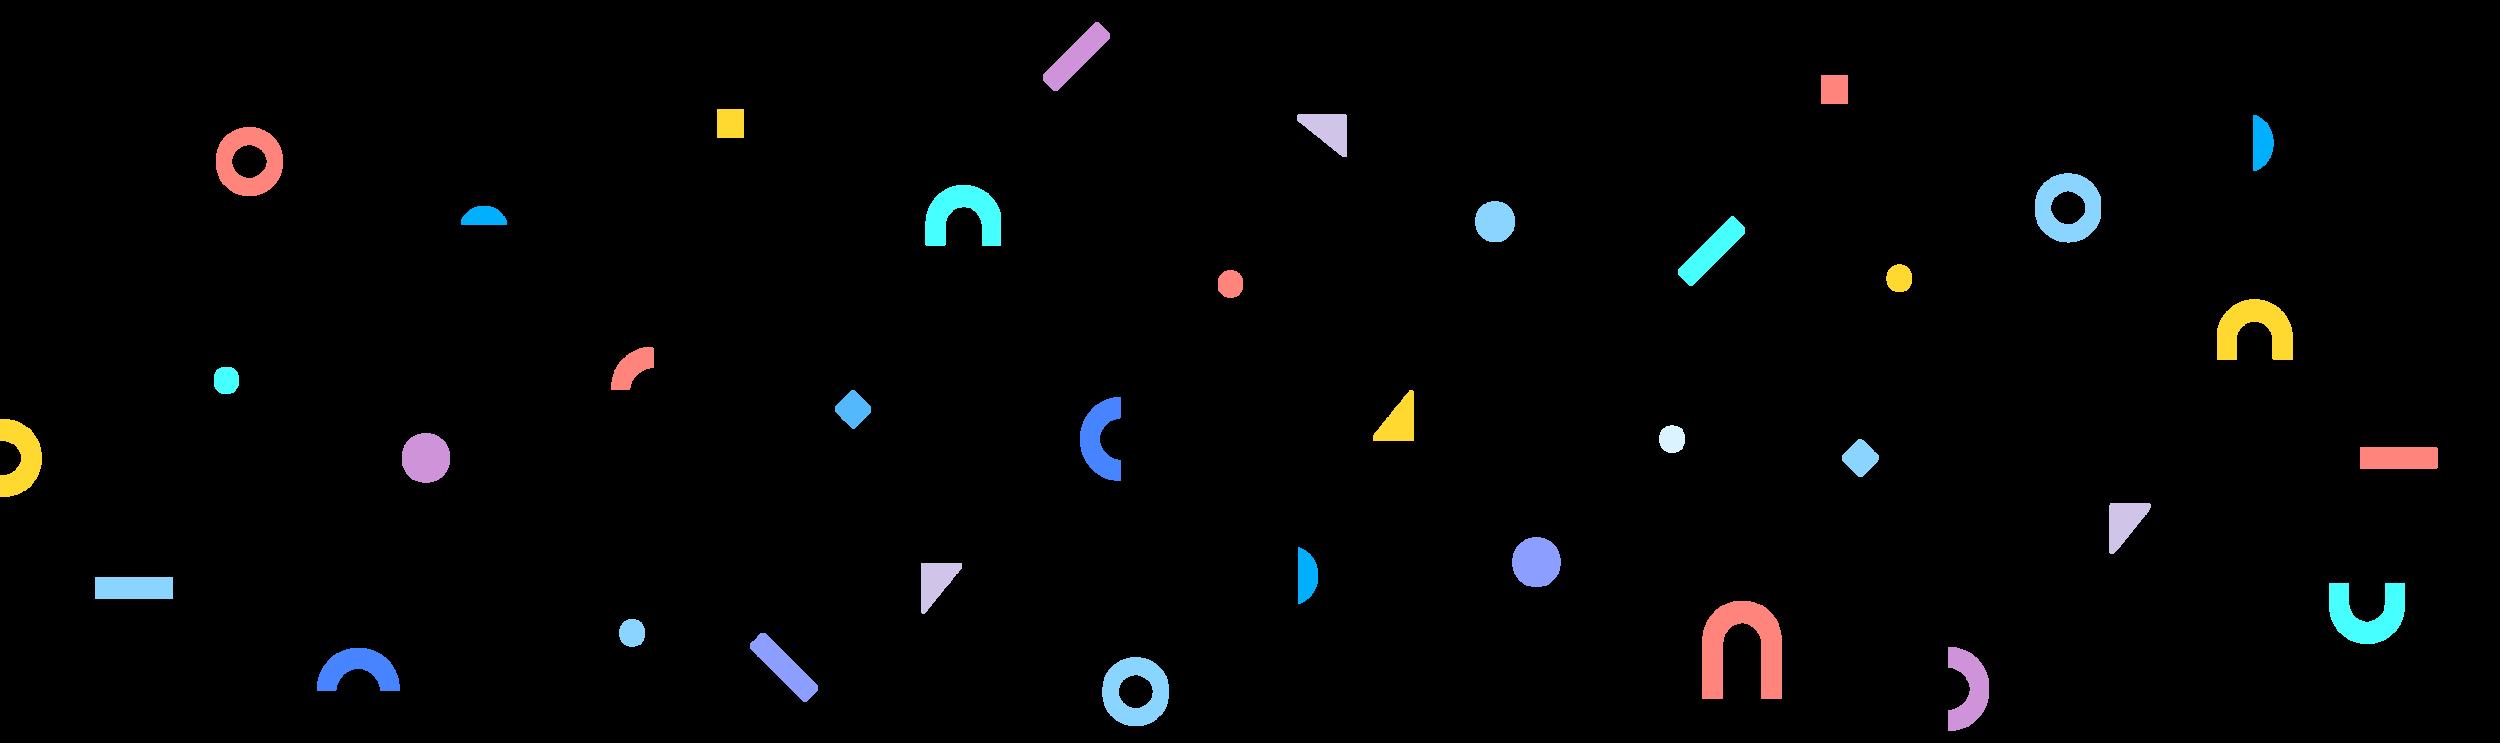 Tenor_Logo_Casestudy_Pattern.png